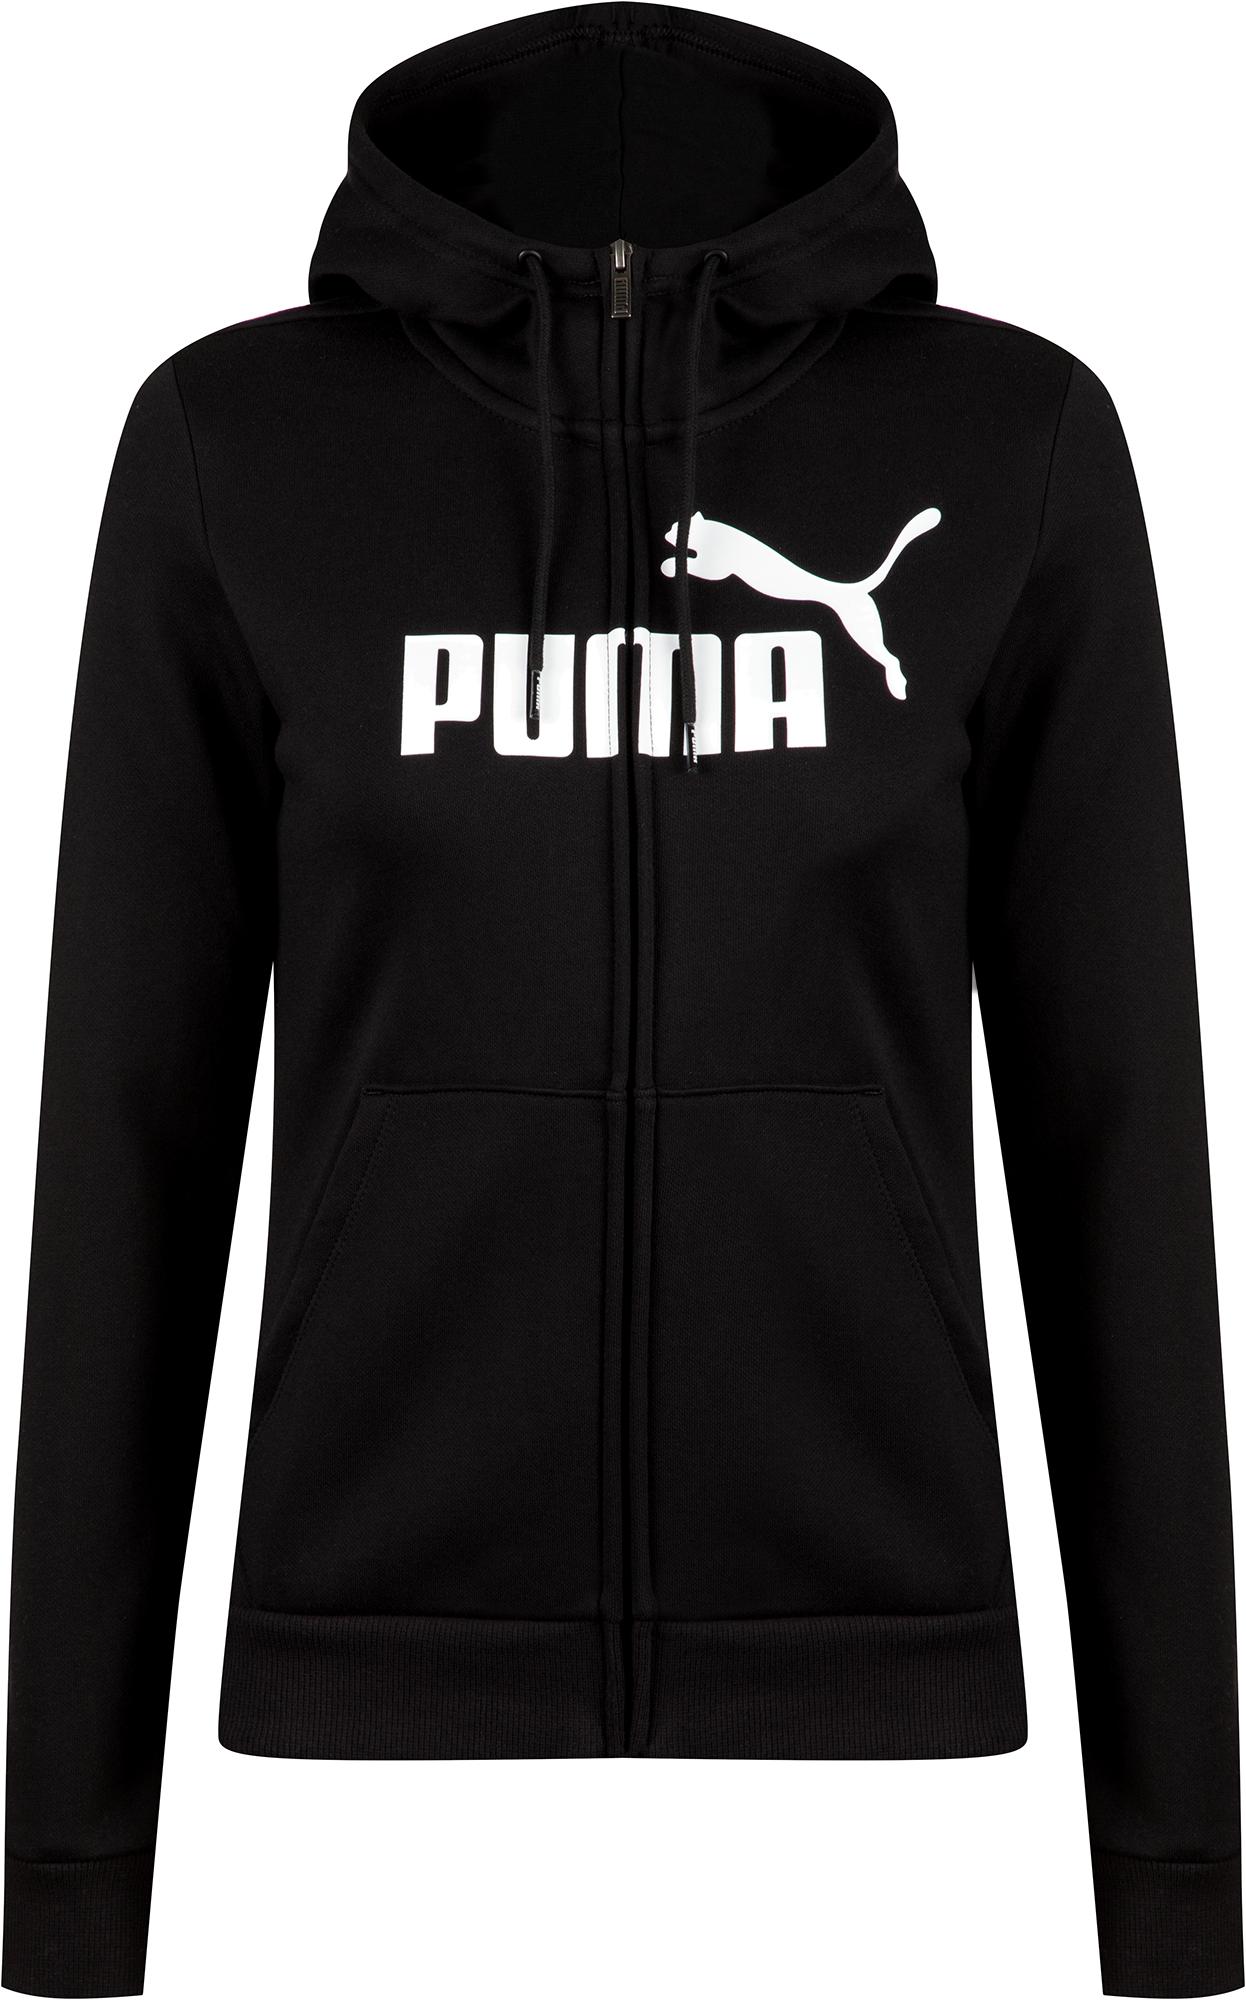 цена на PUMA Толстовка женская Puma Essential, размер 44-46